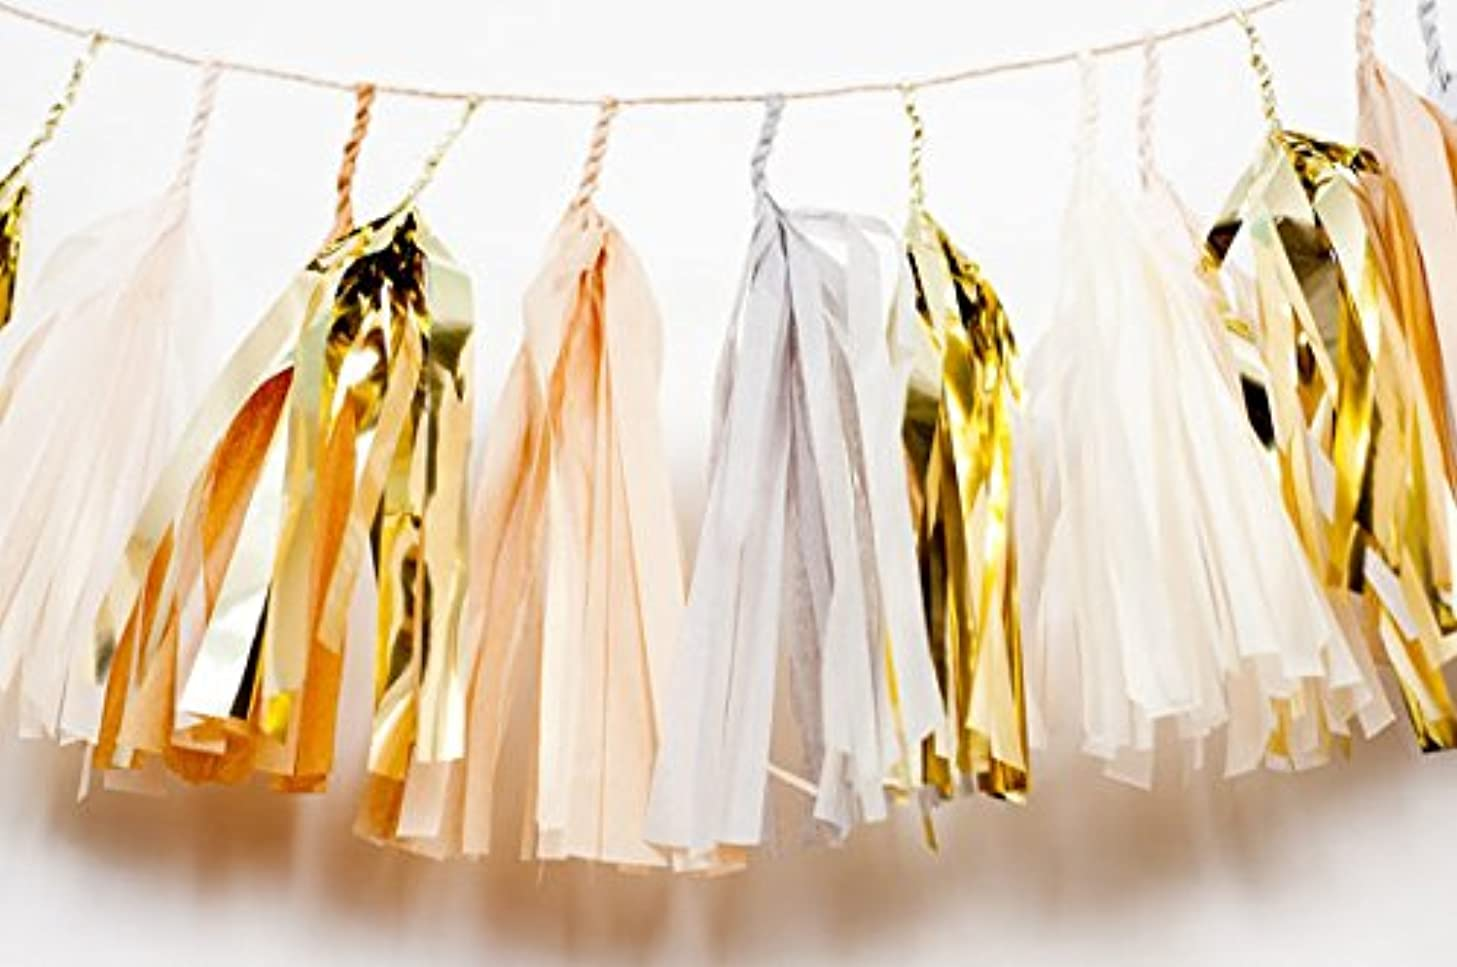 16 x Design TISSUE PAPER TASSELS for Party Wedding gold Garland Bunting Pom Pom